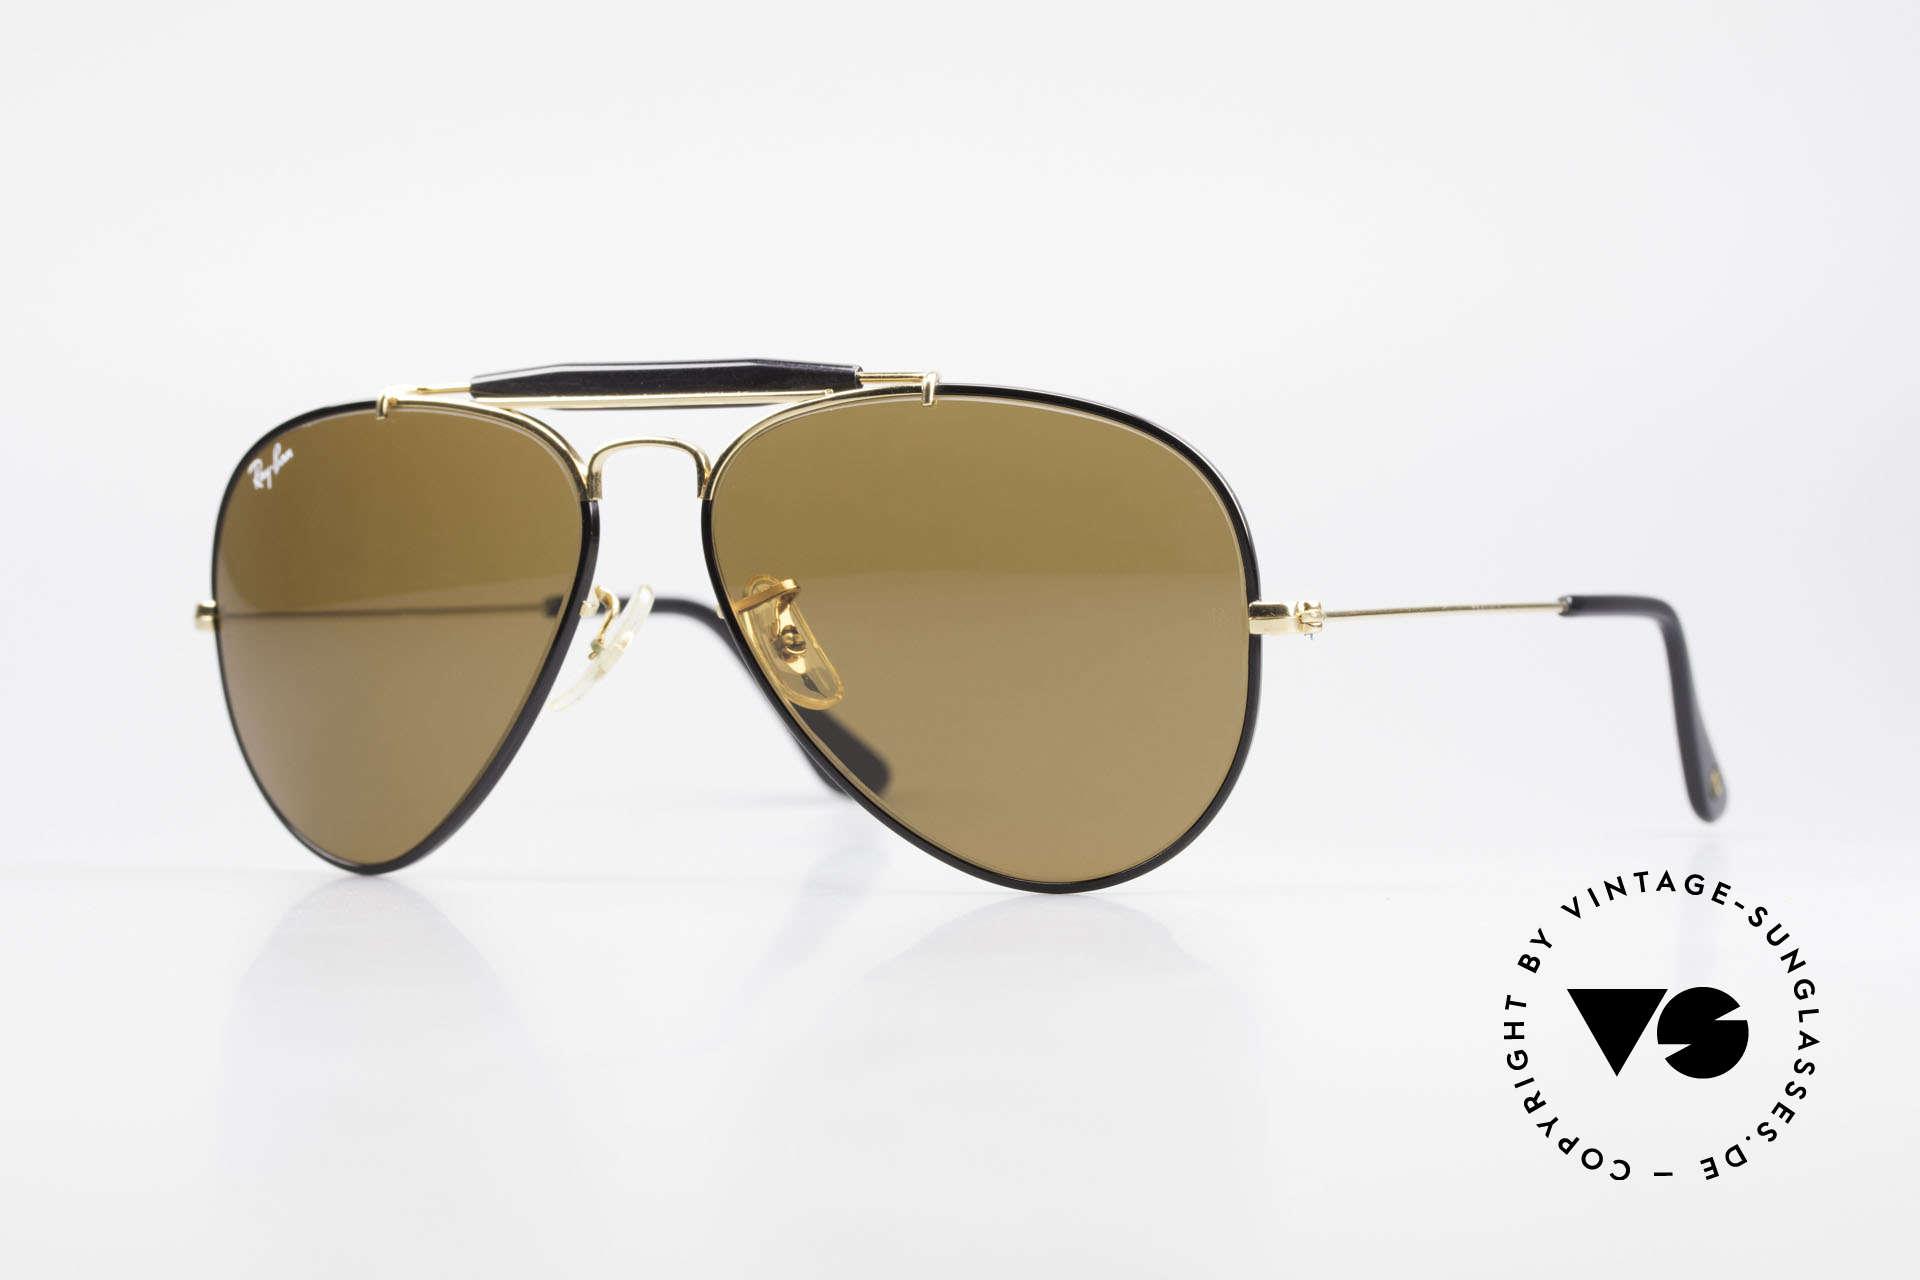 Ray Ban Outdoorsman Precious Metals Ray-Ban USA, costly vintage RAY-BAN B&L aviator sunglasses, Made for Men and Women